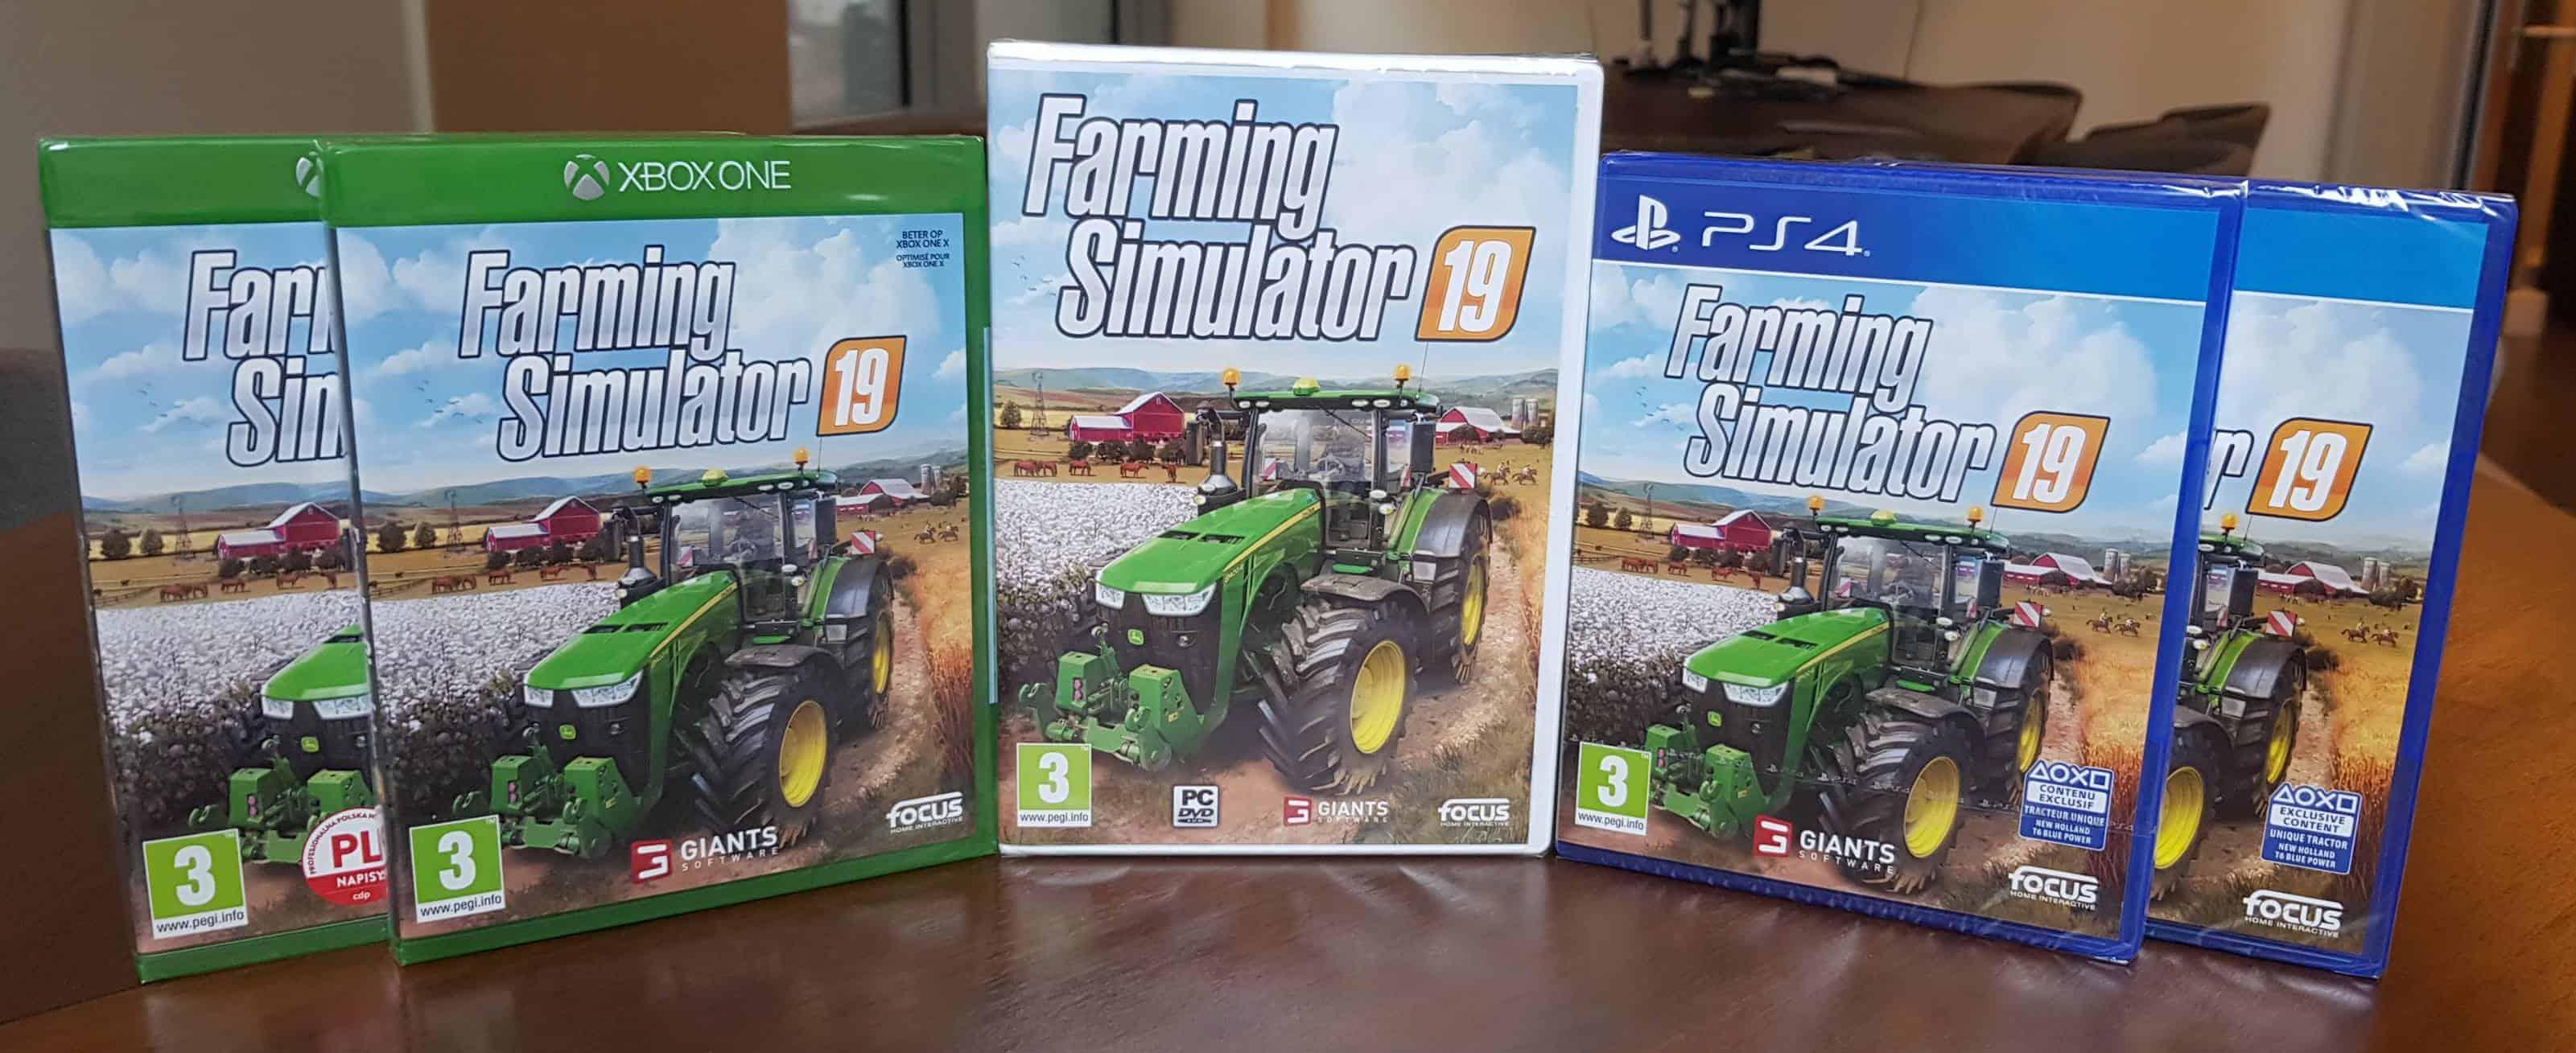 Farming Simulator 19 boxes arrived! - Farming Simulator 19 Mod / FS19